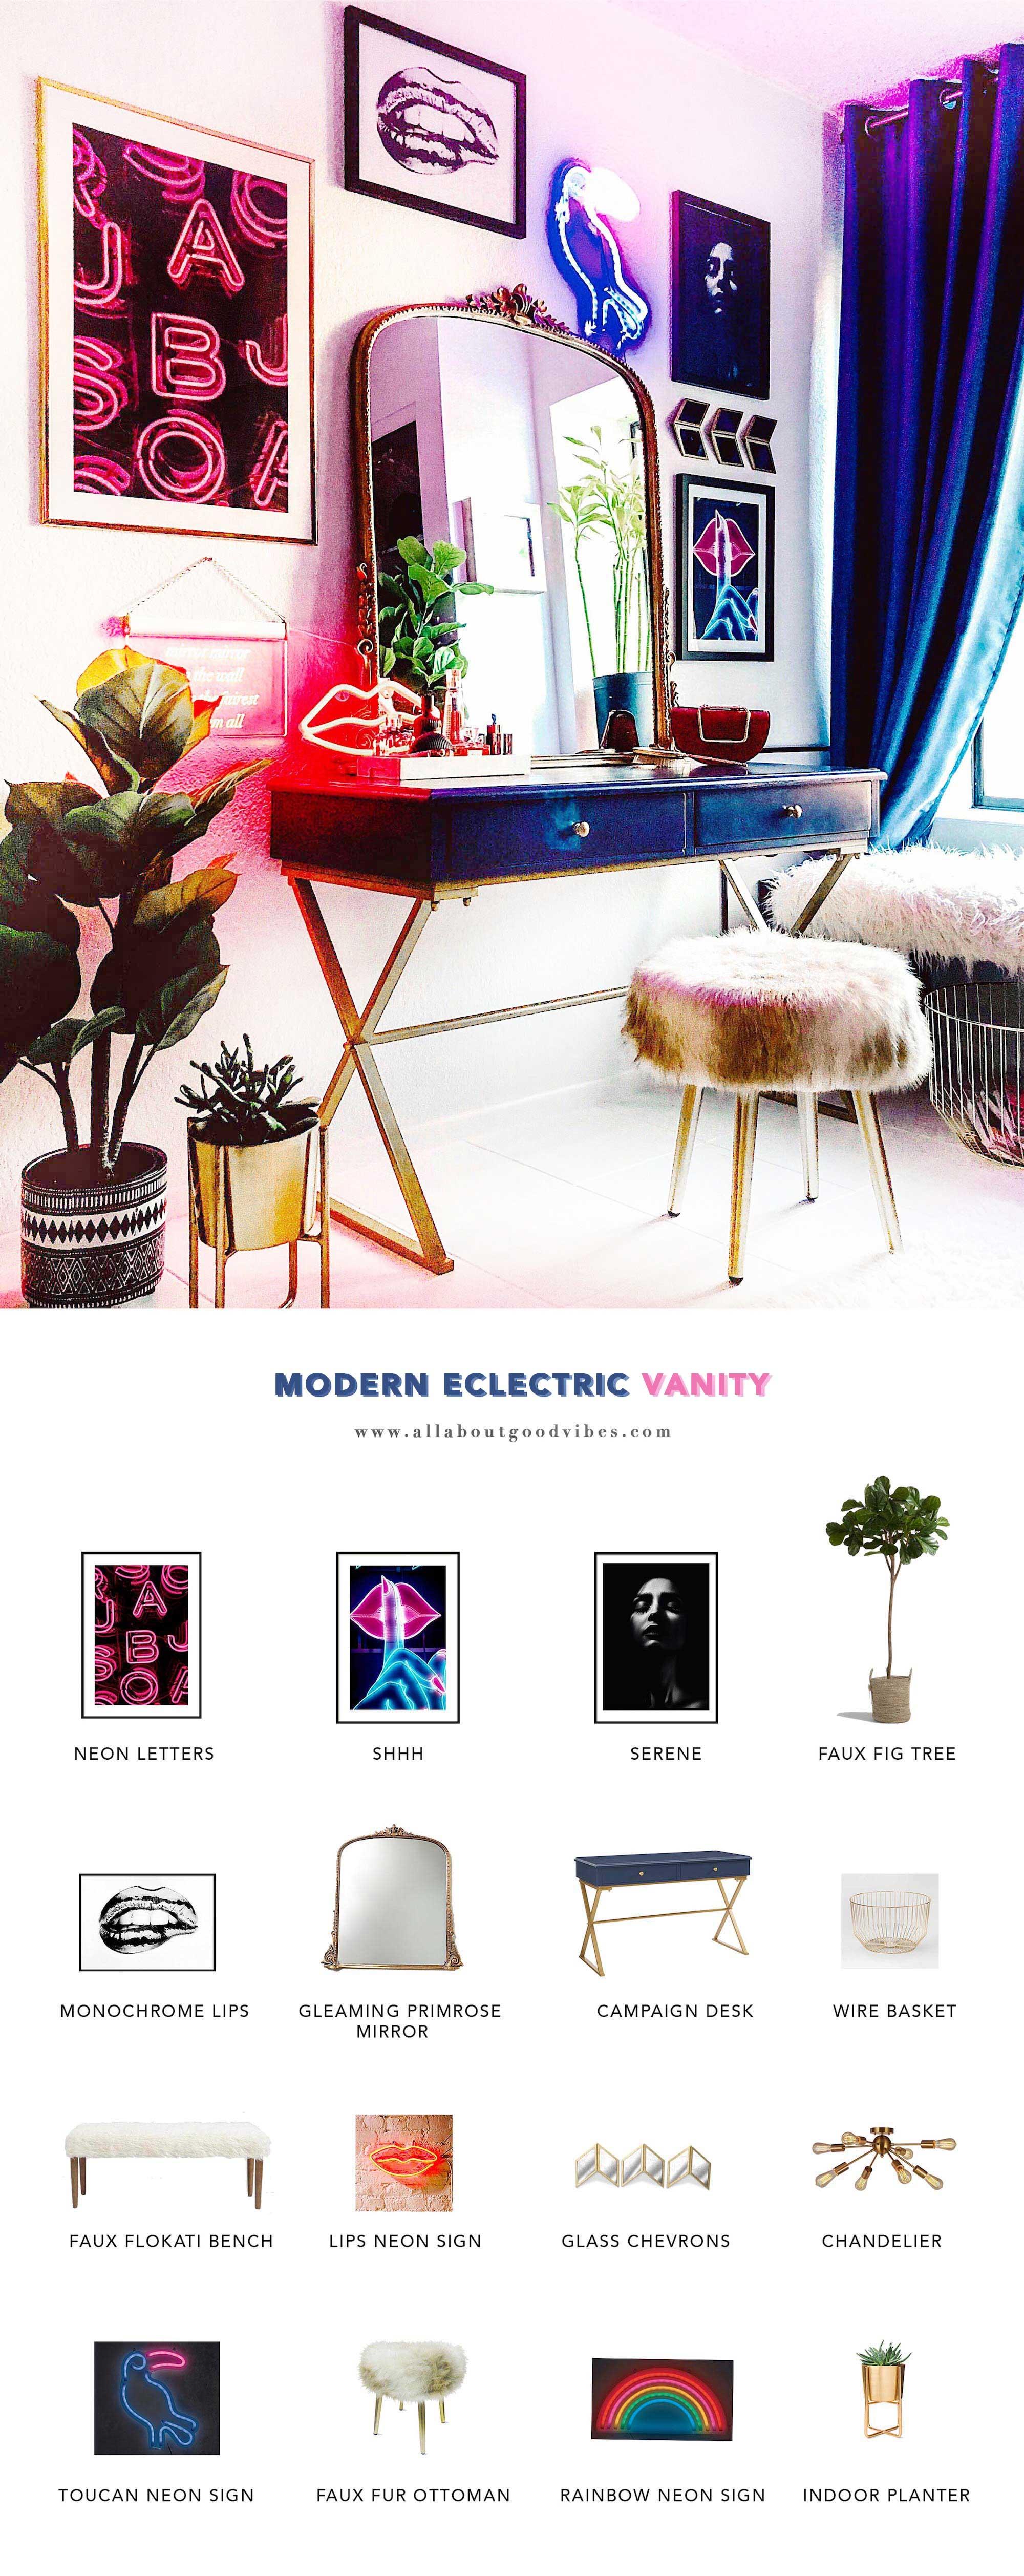 makeup-vanity-get the look Modern Eclectic Vanity with Desenio | Free Phone and Desktop wallpapers download